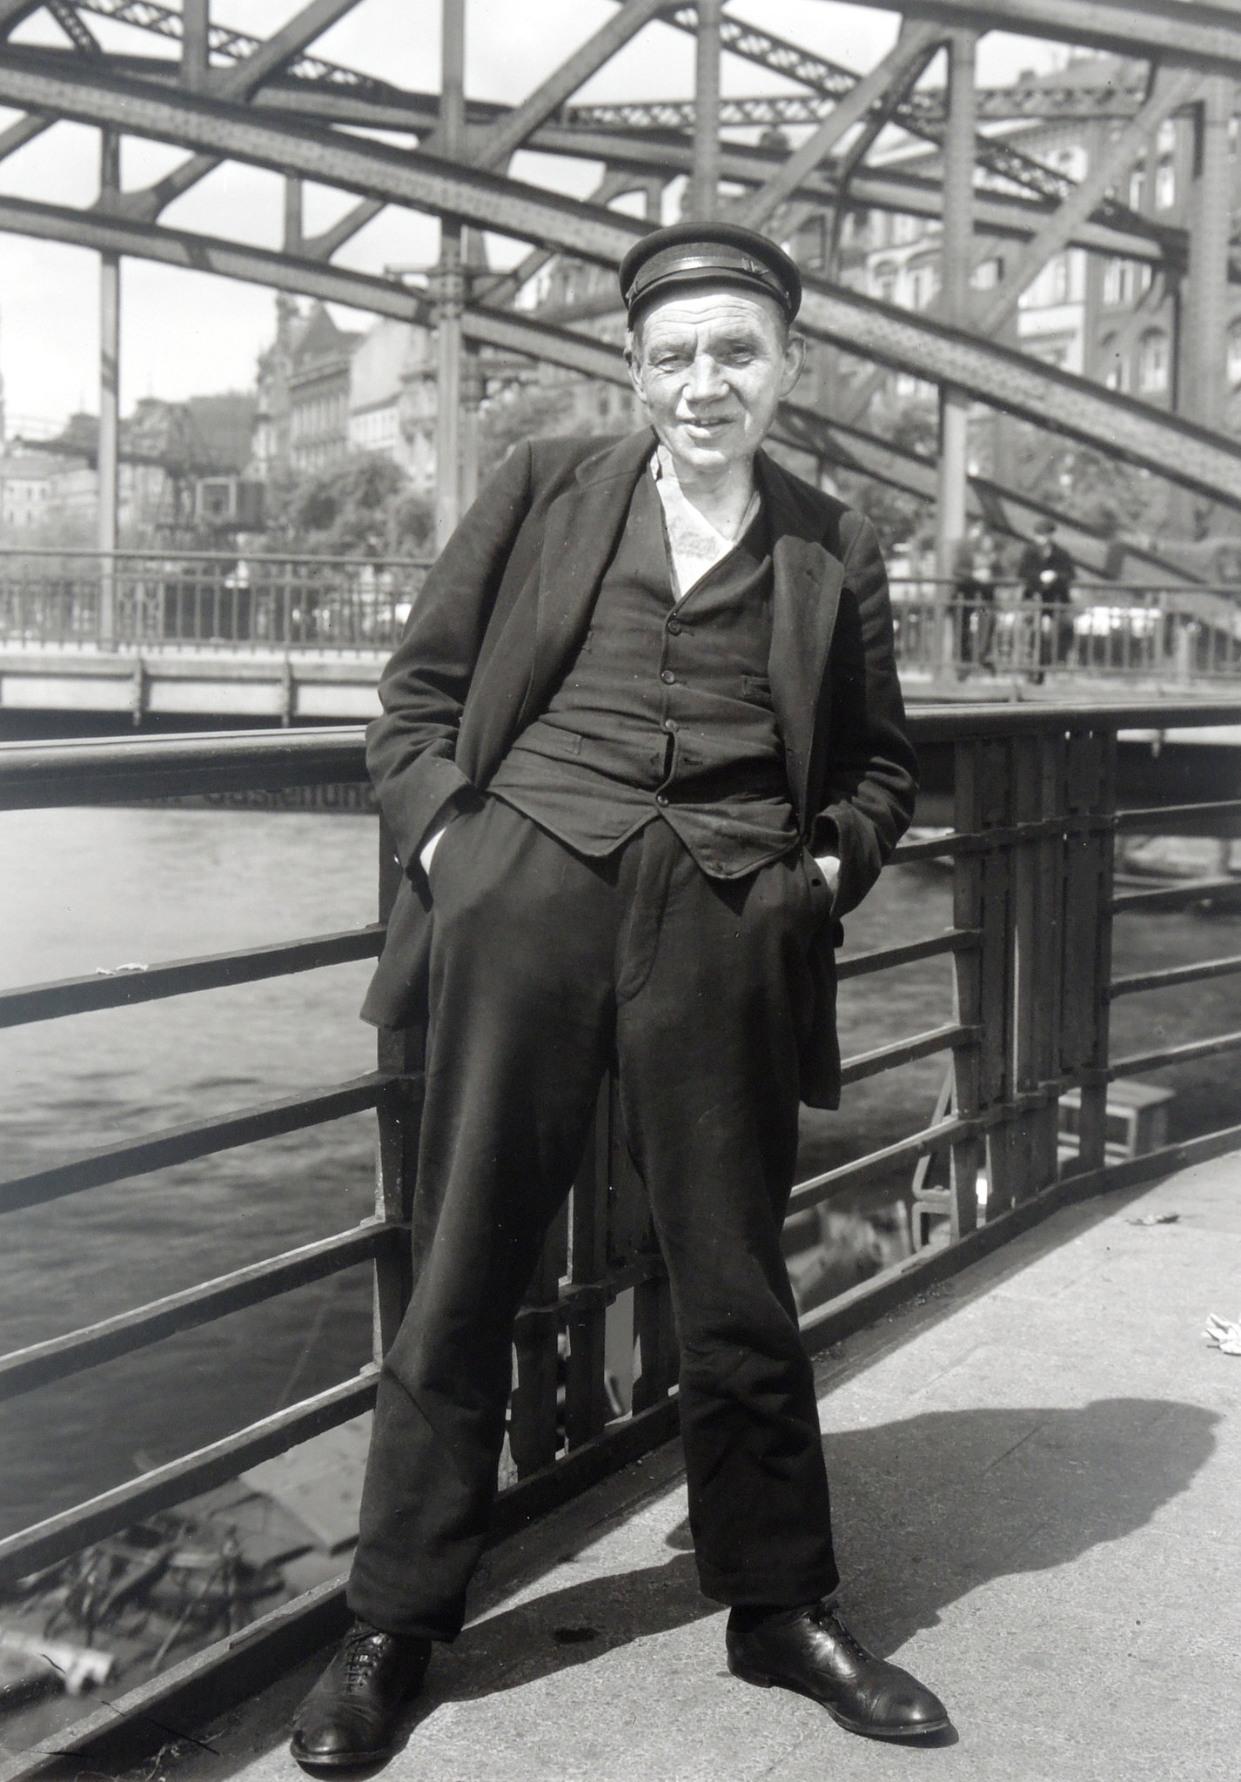 Unemployed sailor, August Sunder photos